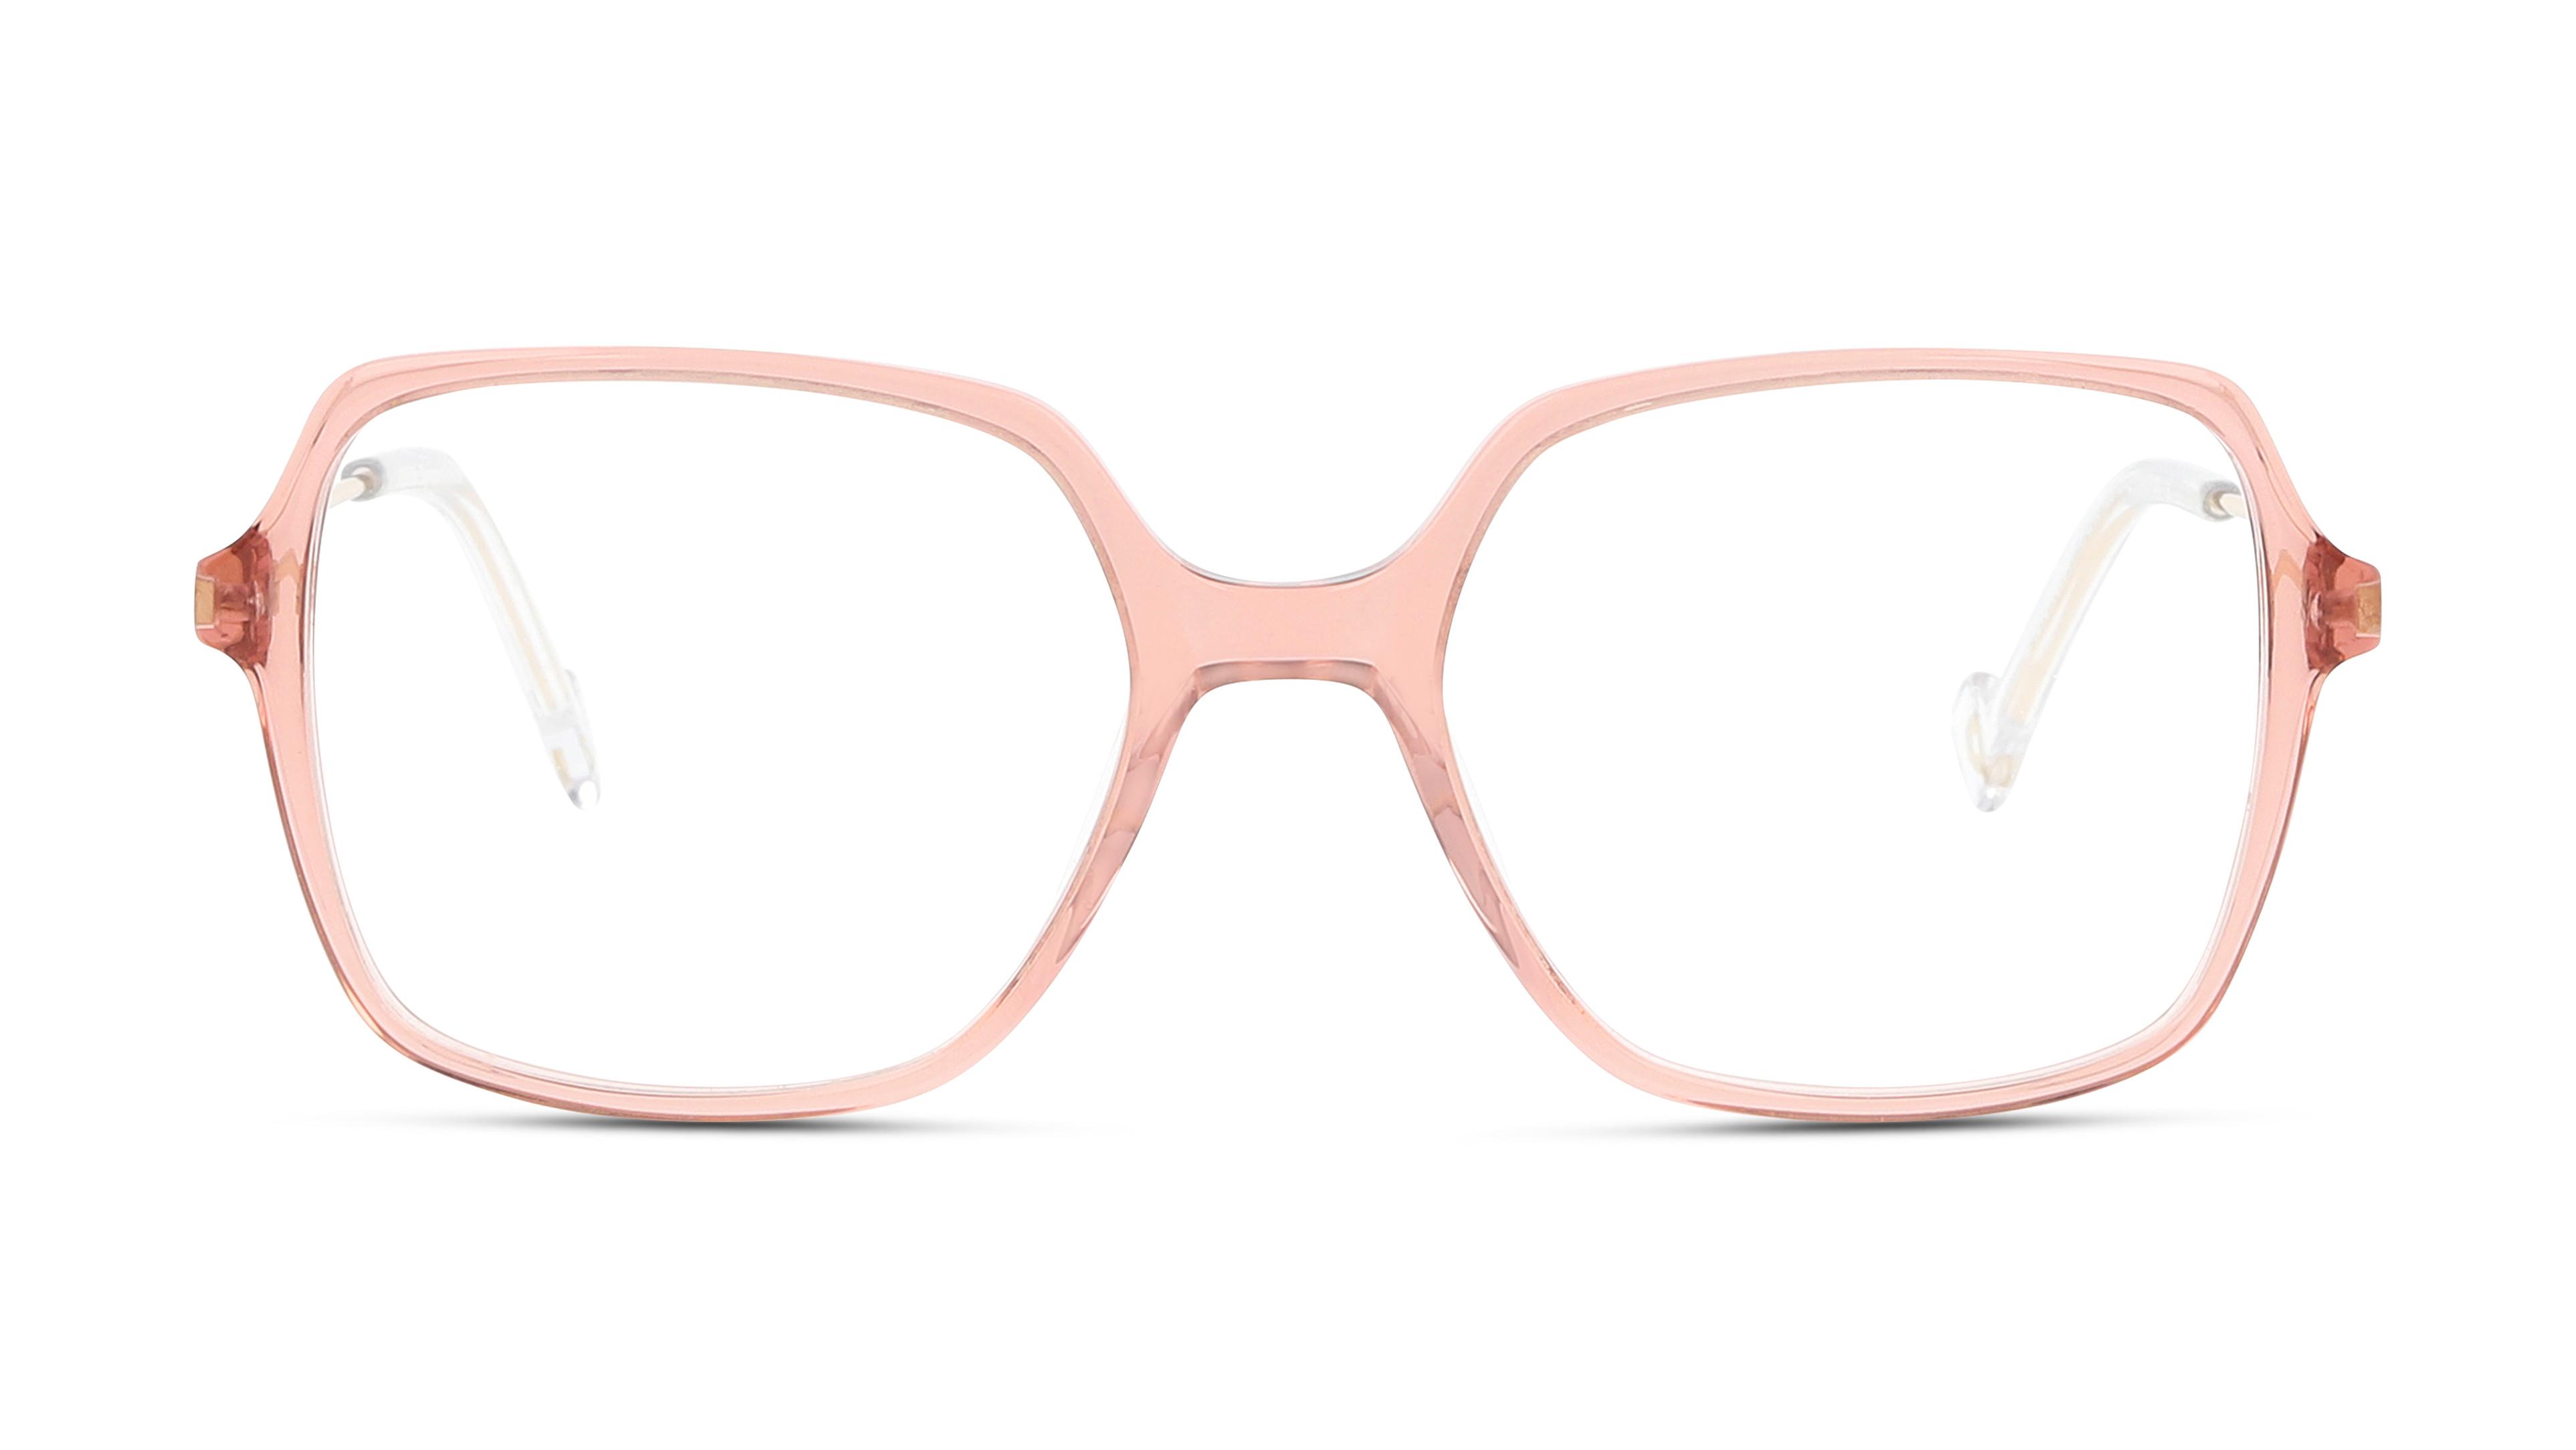 8719154739941-front-brillenfassung-unofficial-unot0048-shape-up-box-13-pink-gold